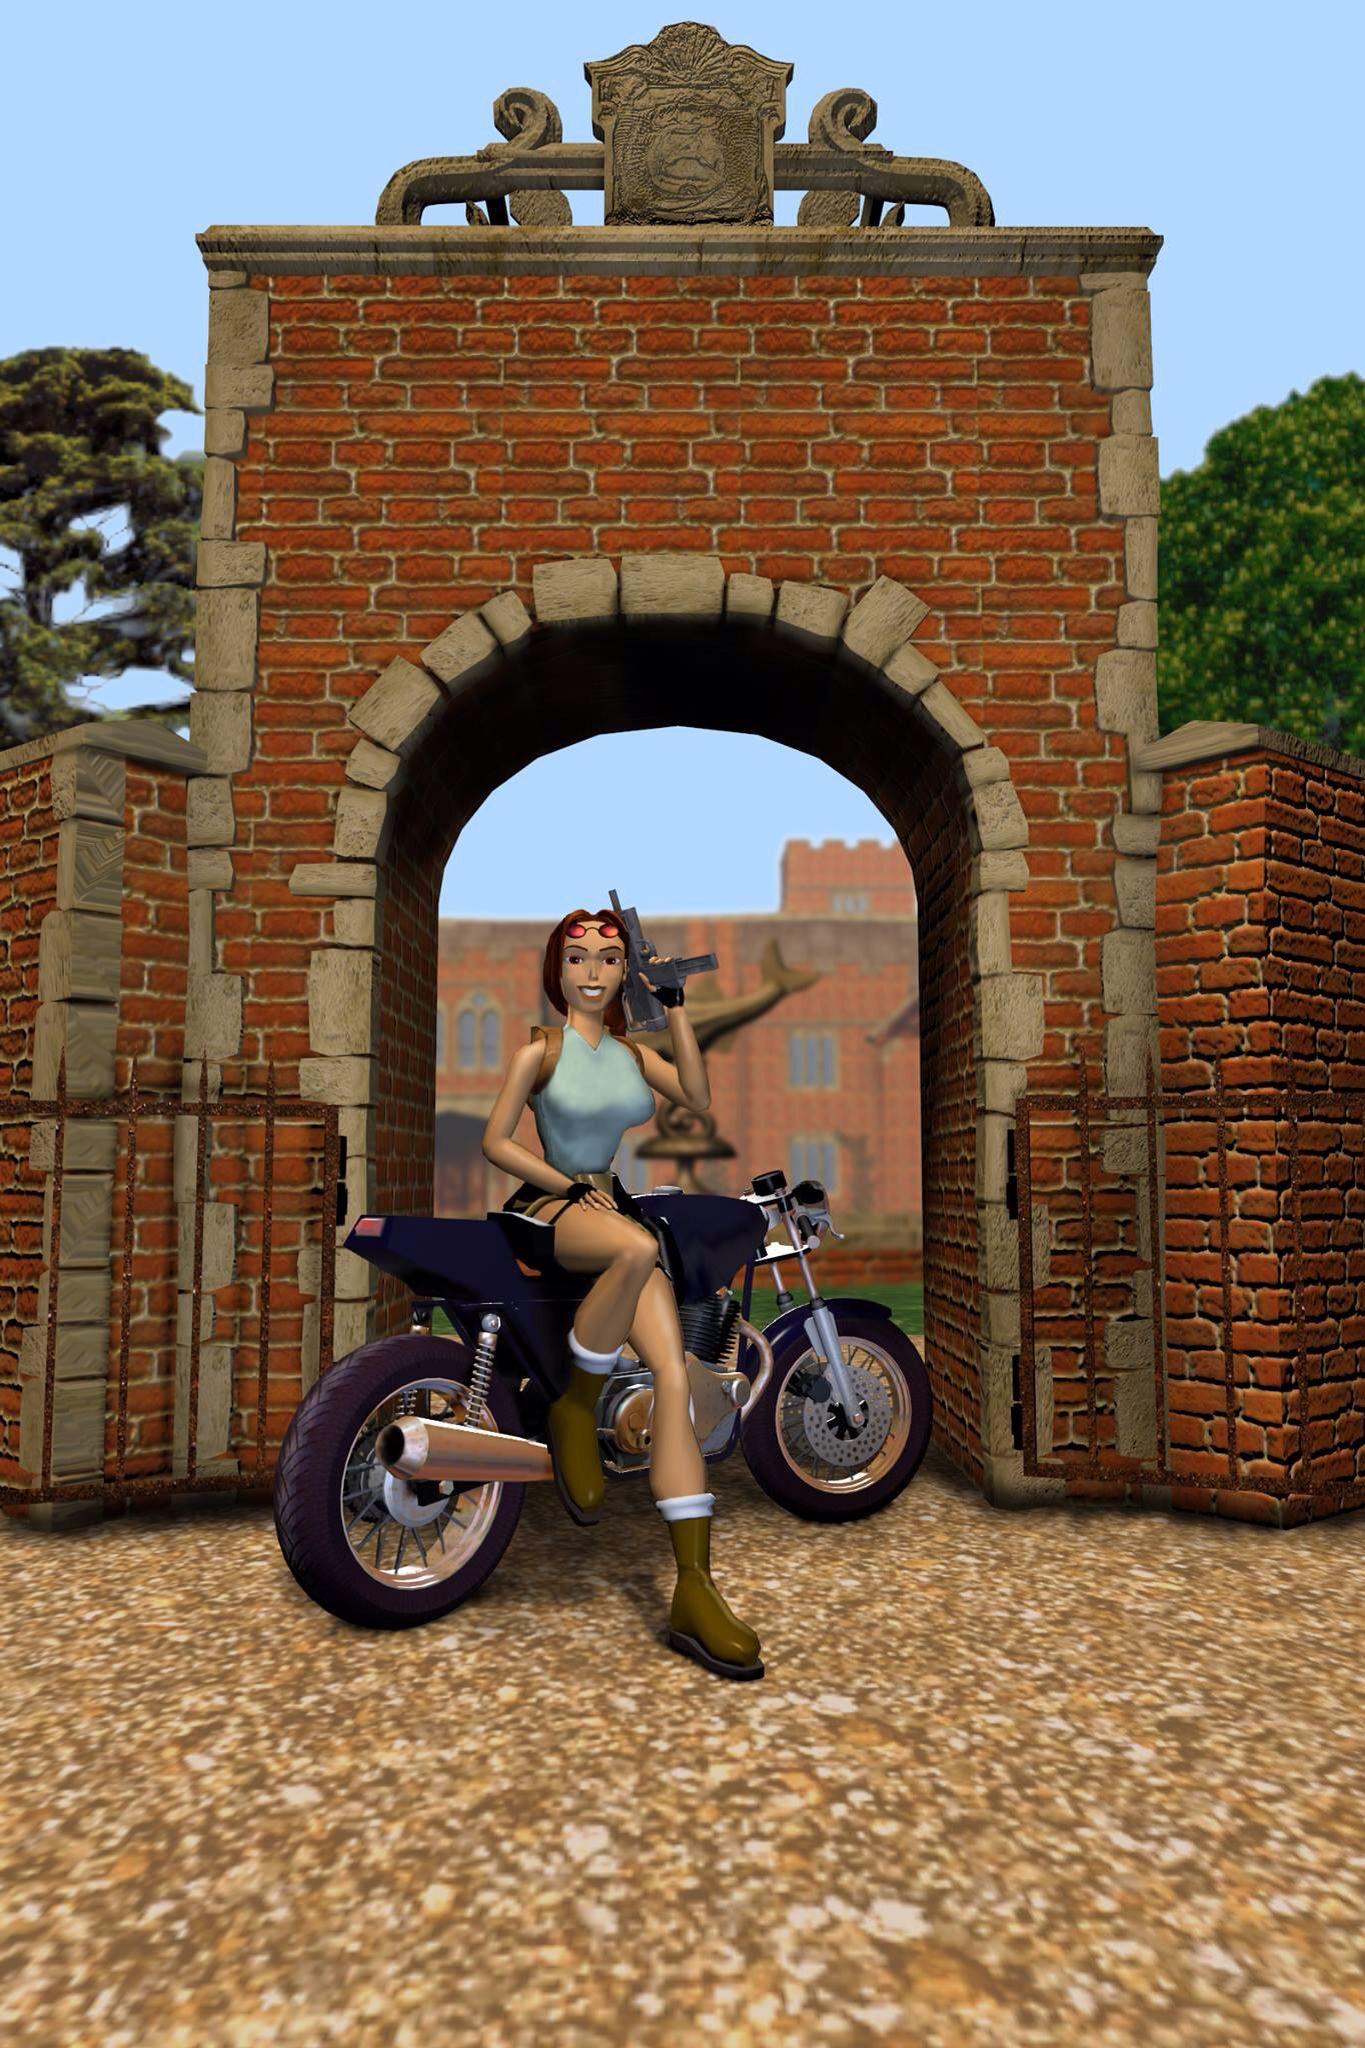 bol.com | Tomb Raider (2013) - Survival Edition | Games